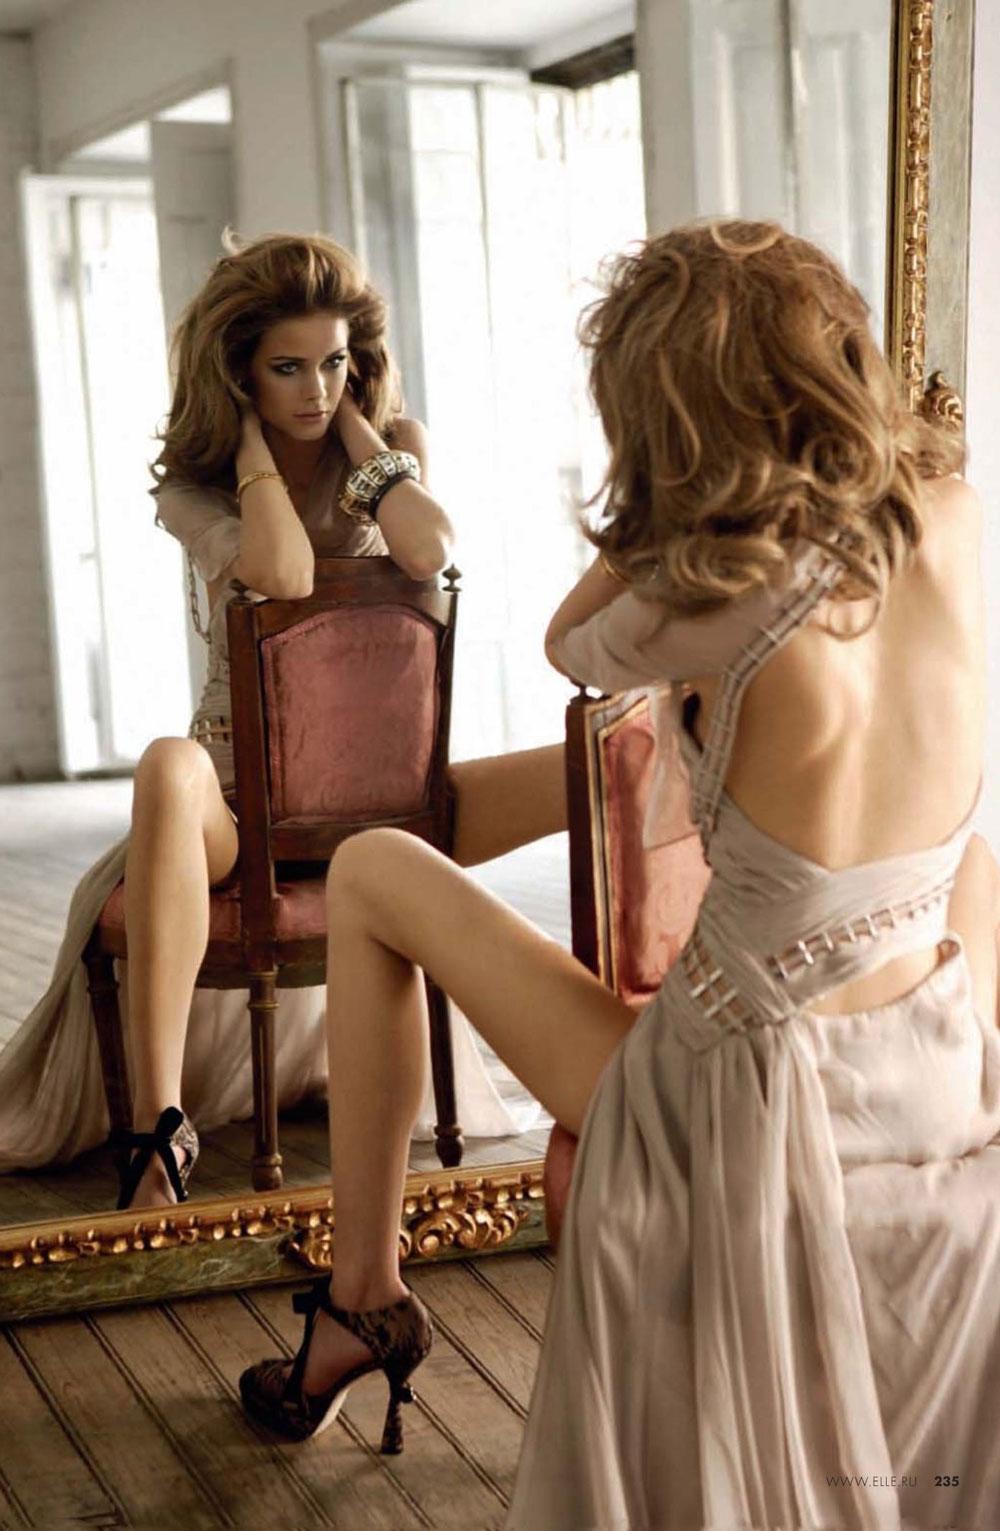 Flavia de Oliveira in Elle Russia November 2009 (photography: Mario Sierra, styling: Inmaculada Jimenez)